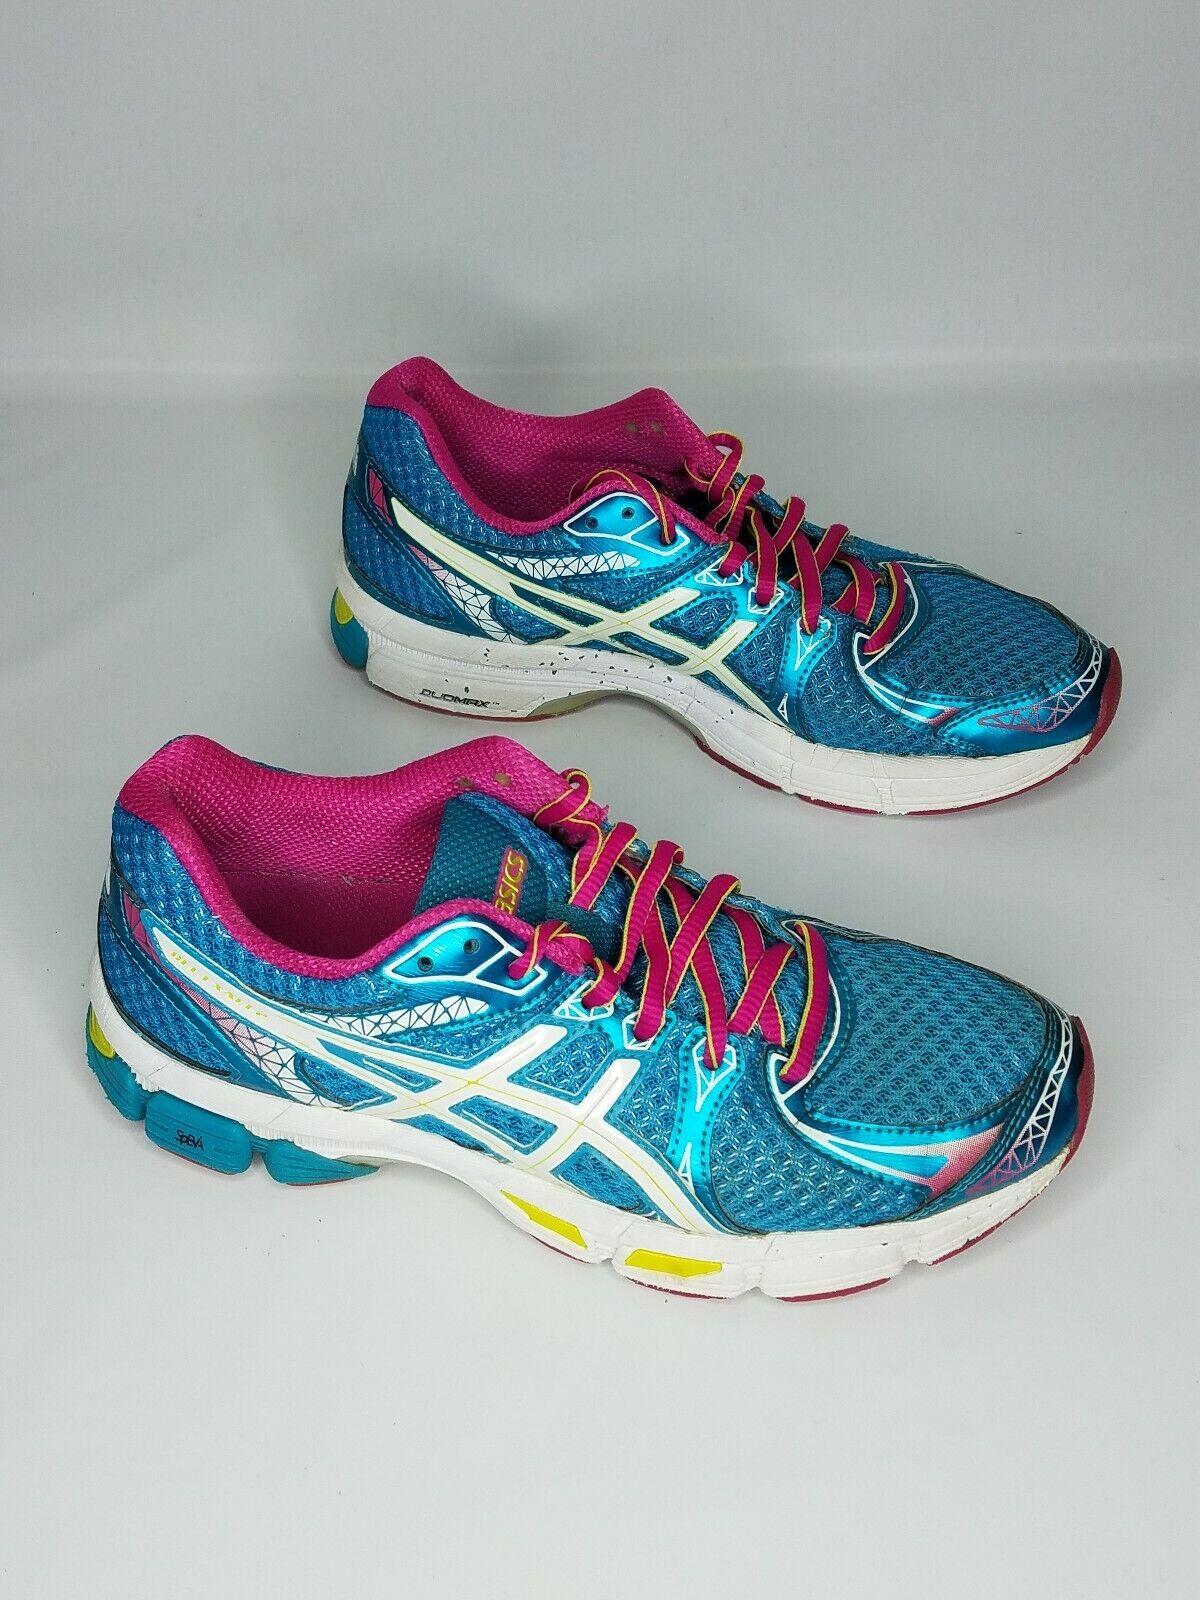 Asics Gel-Exalt 2 Running shoes Womens Size 8 T4B6N